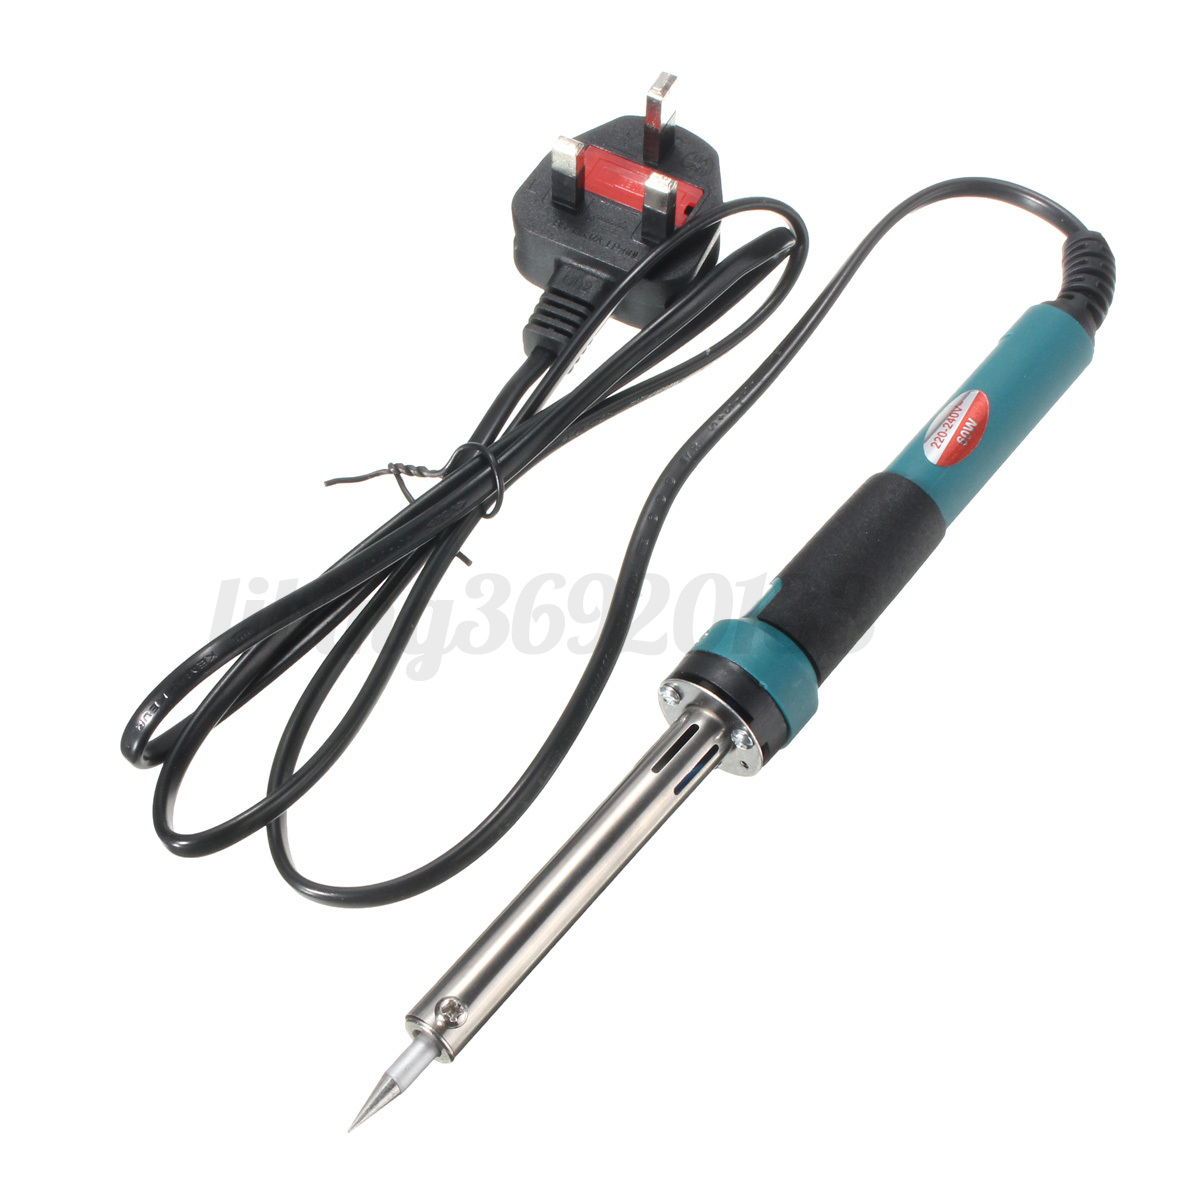 60w uk eu usplug electric welding soldering gun solder iron heat repair tool ebay. Black Bedroom Furniture Sets. Home Design Ideas